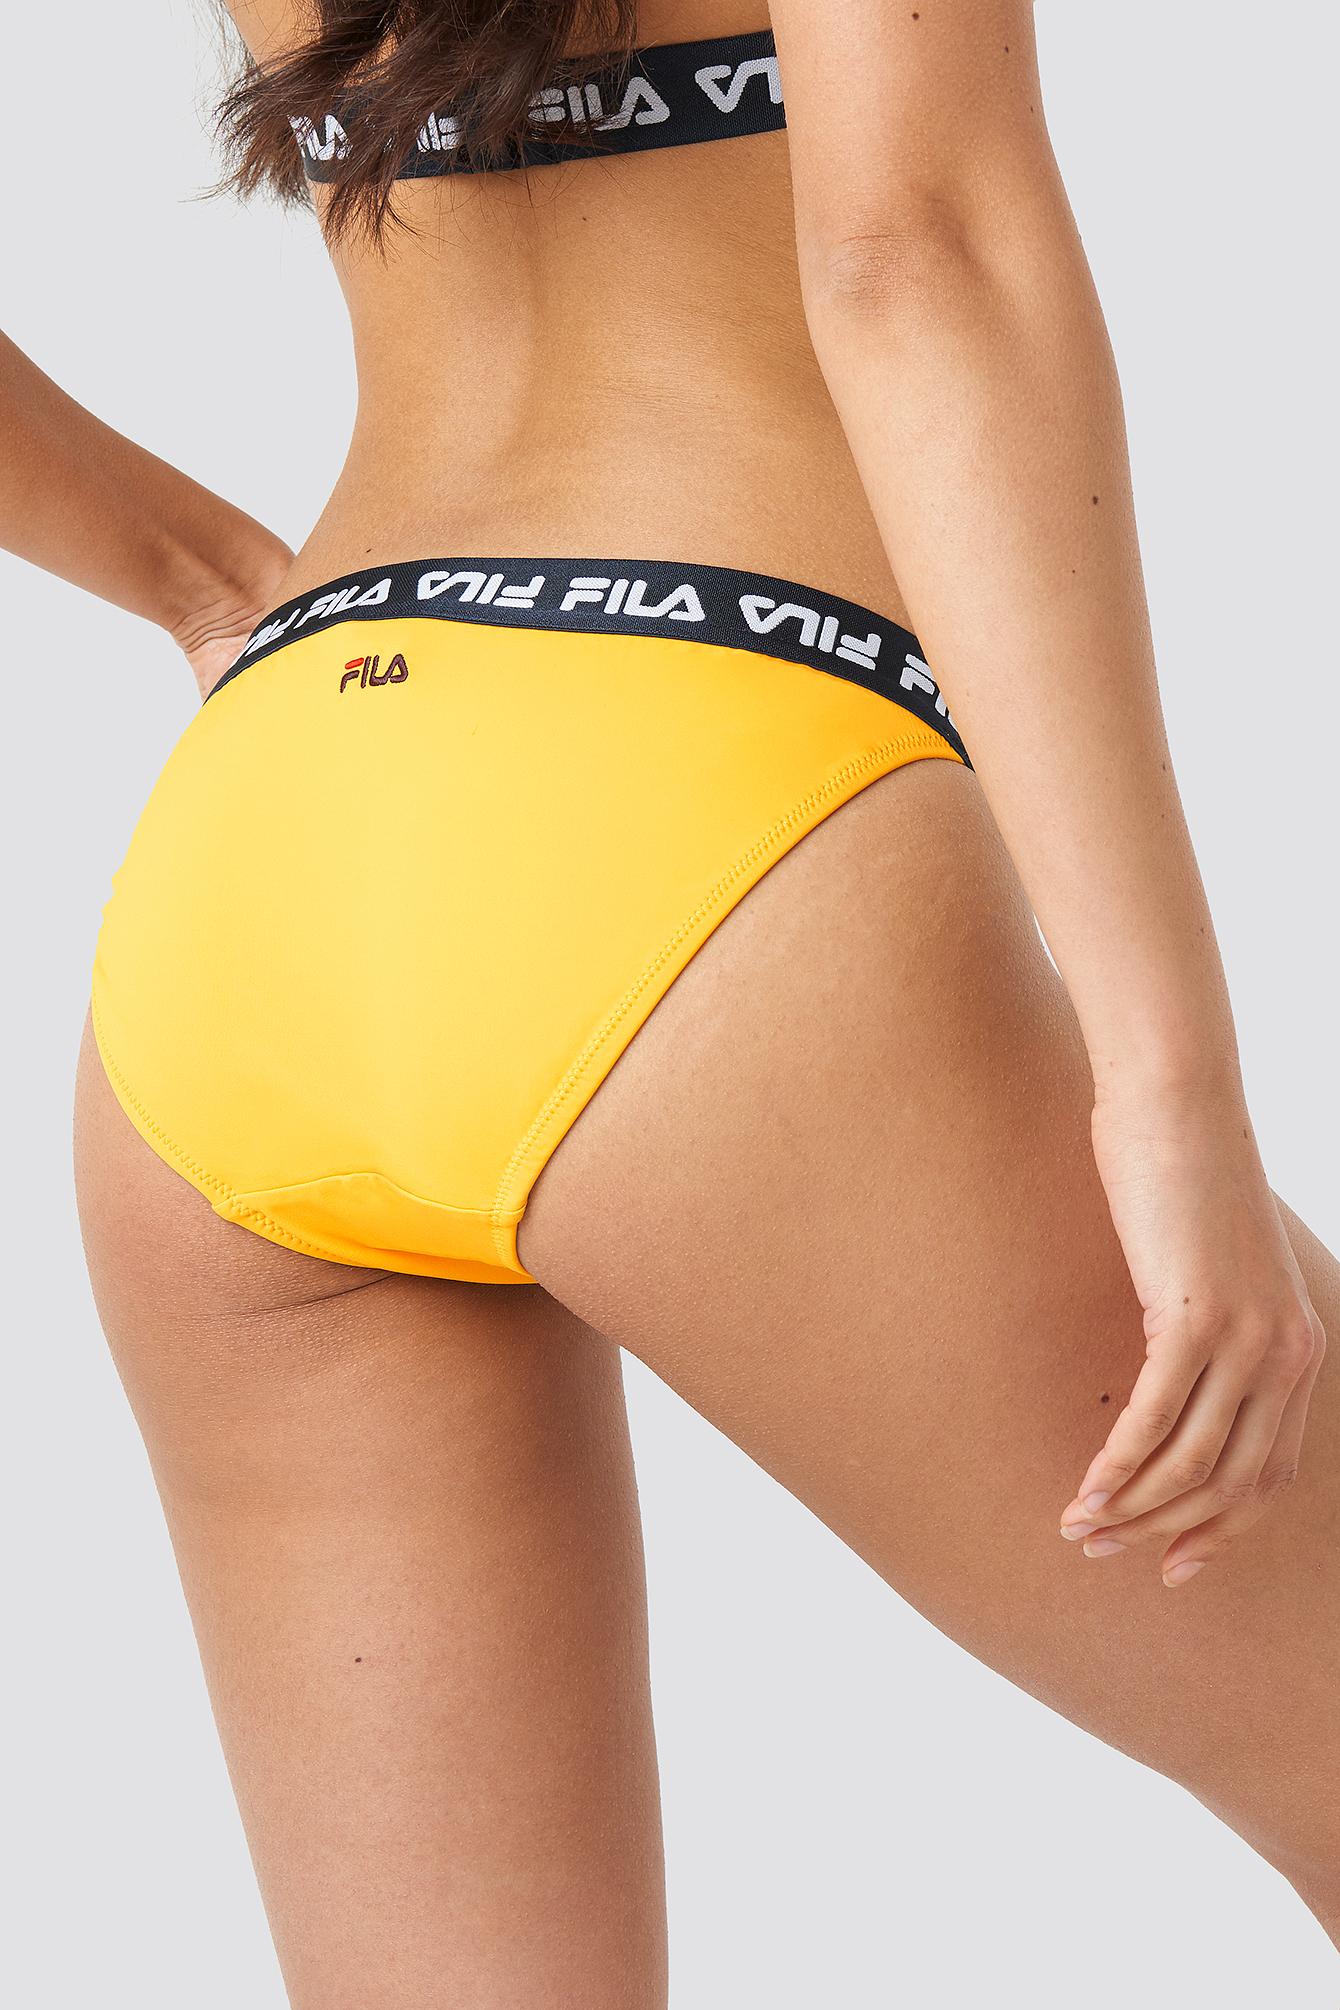 Sally Bikini Bottom x NA-KD NA-KD.COM